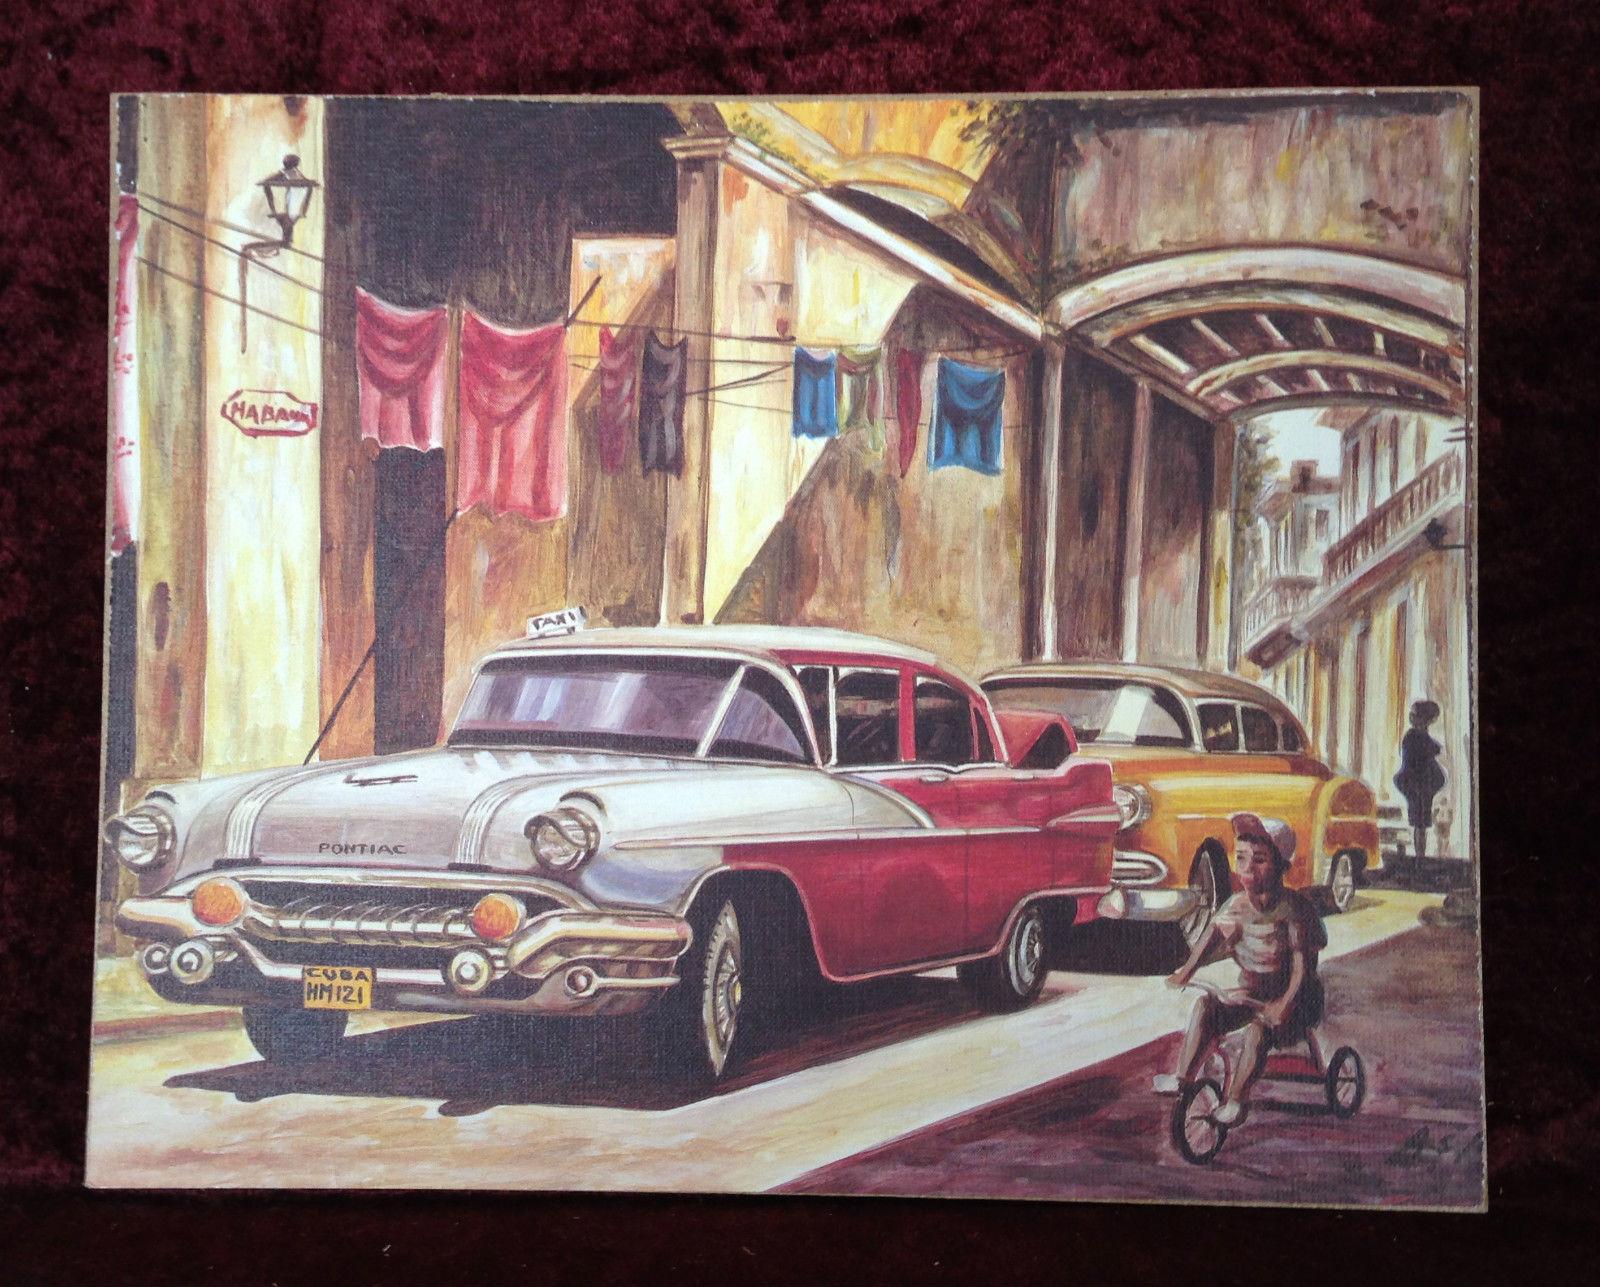 Auto Cuba Rot Bild Rahmen Gold-Weiß Wandbild 45x38 Oldtimer Classic ...